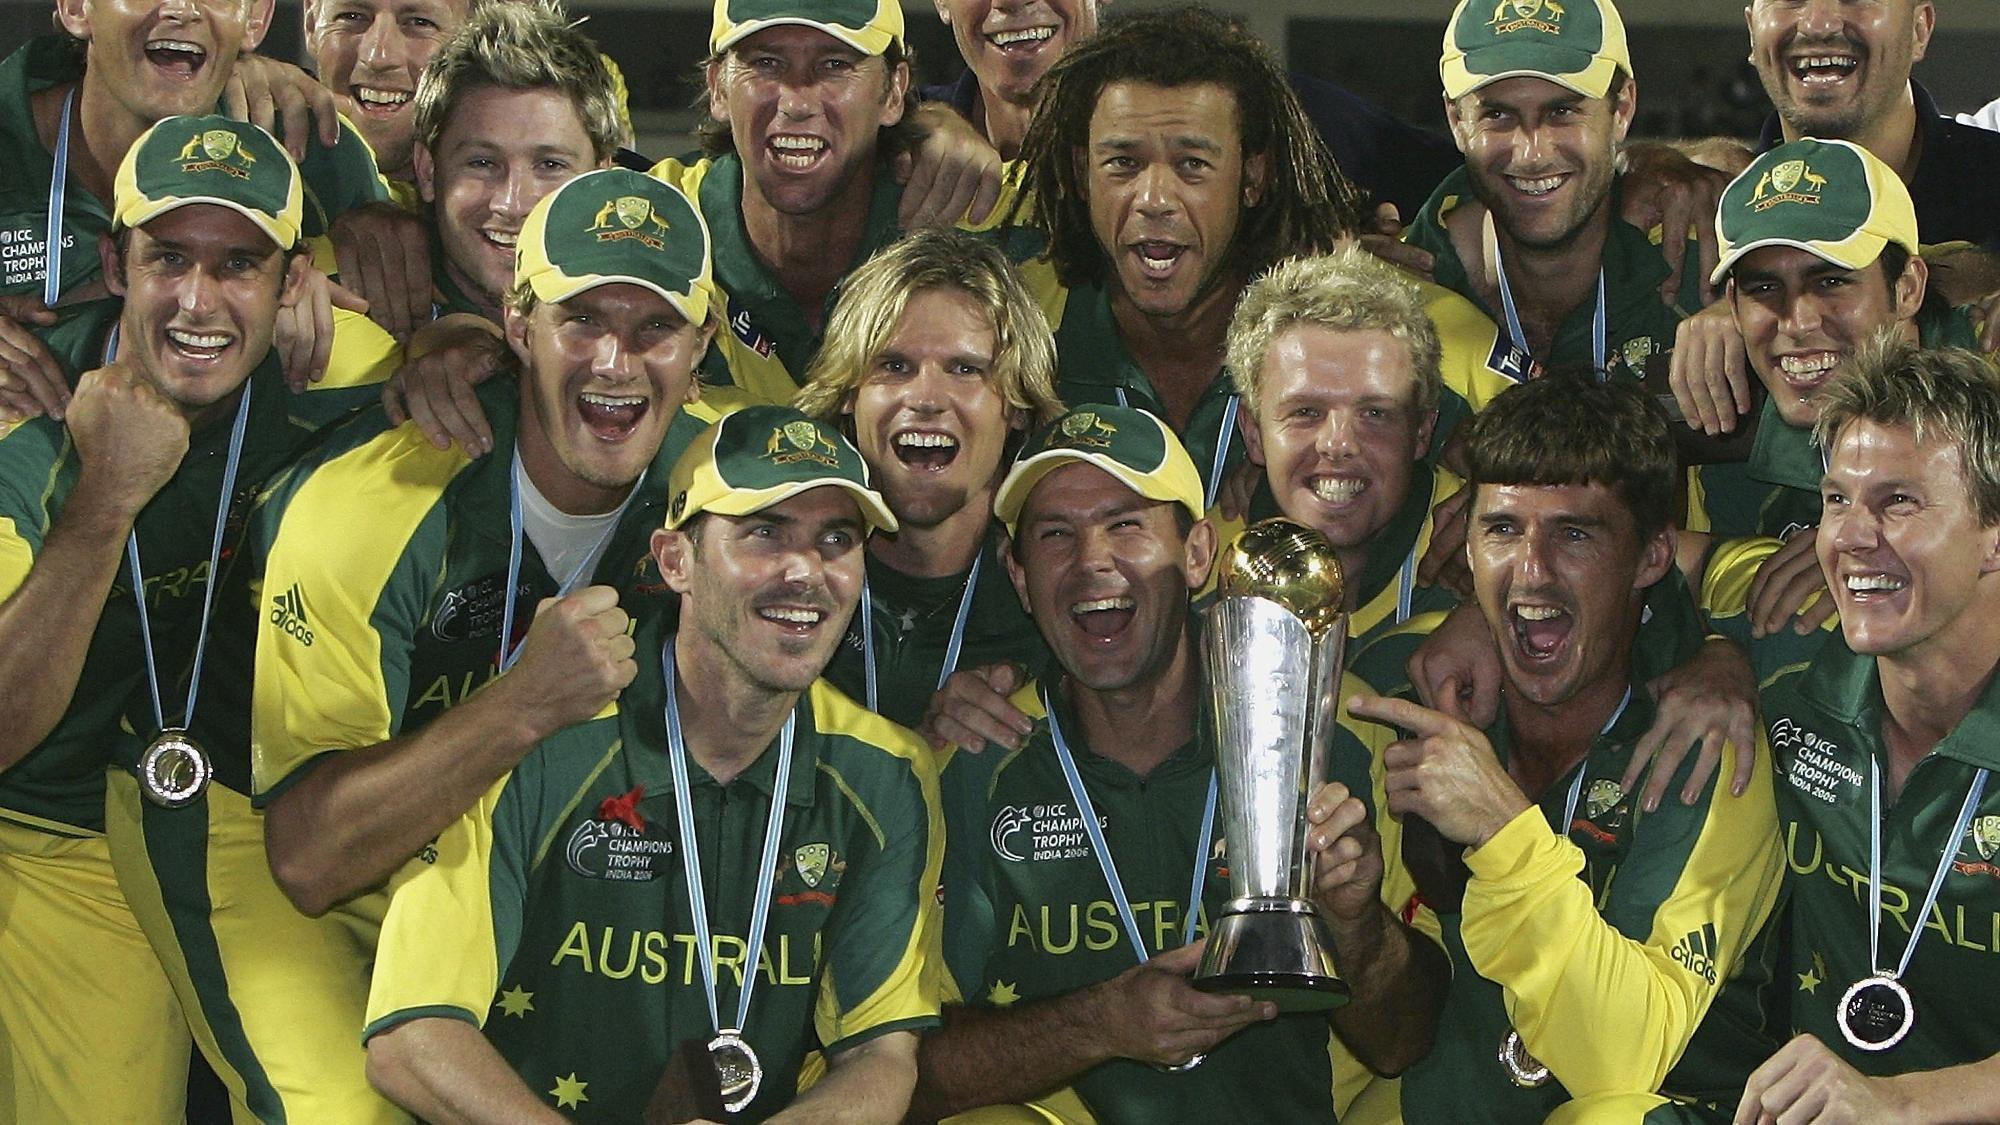 icc-champions-trophy-winners-marathipizza05